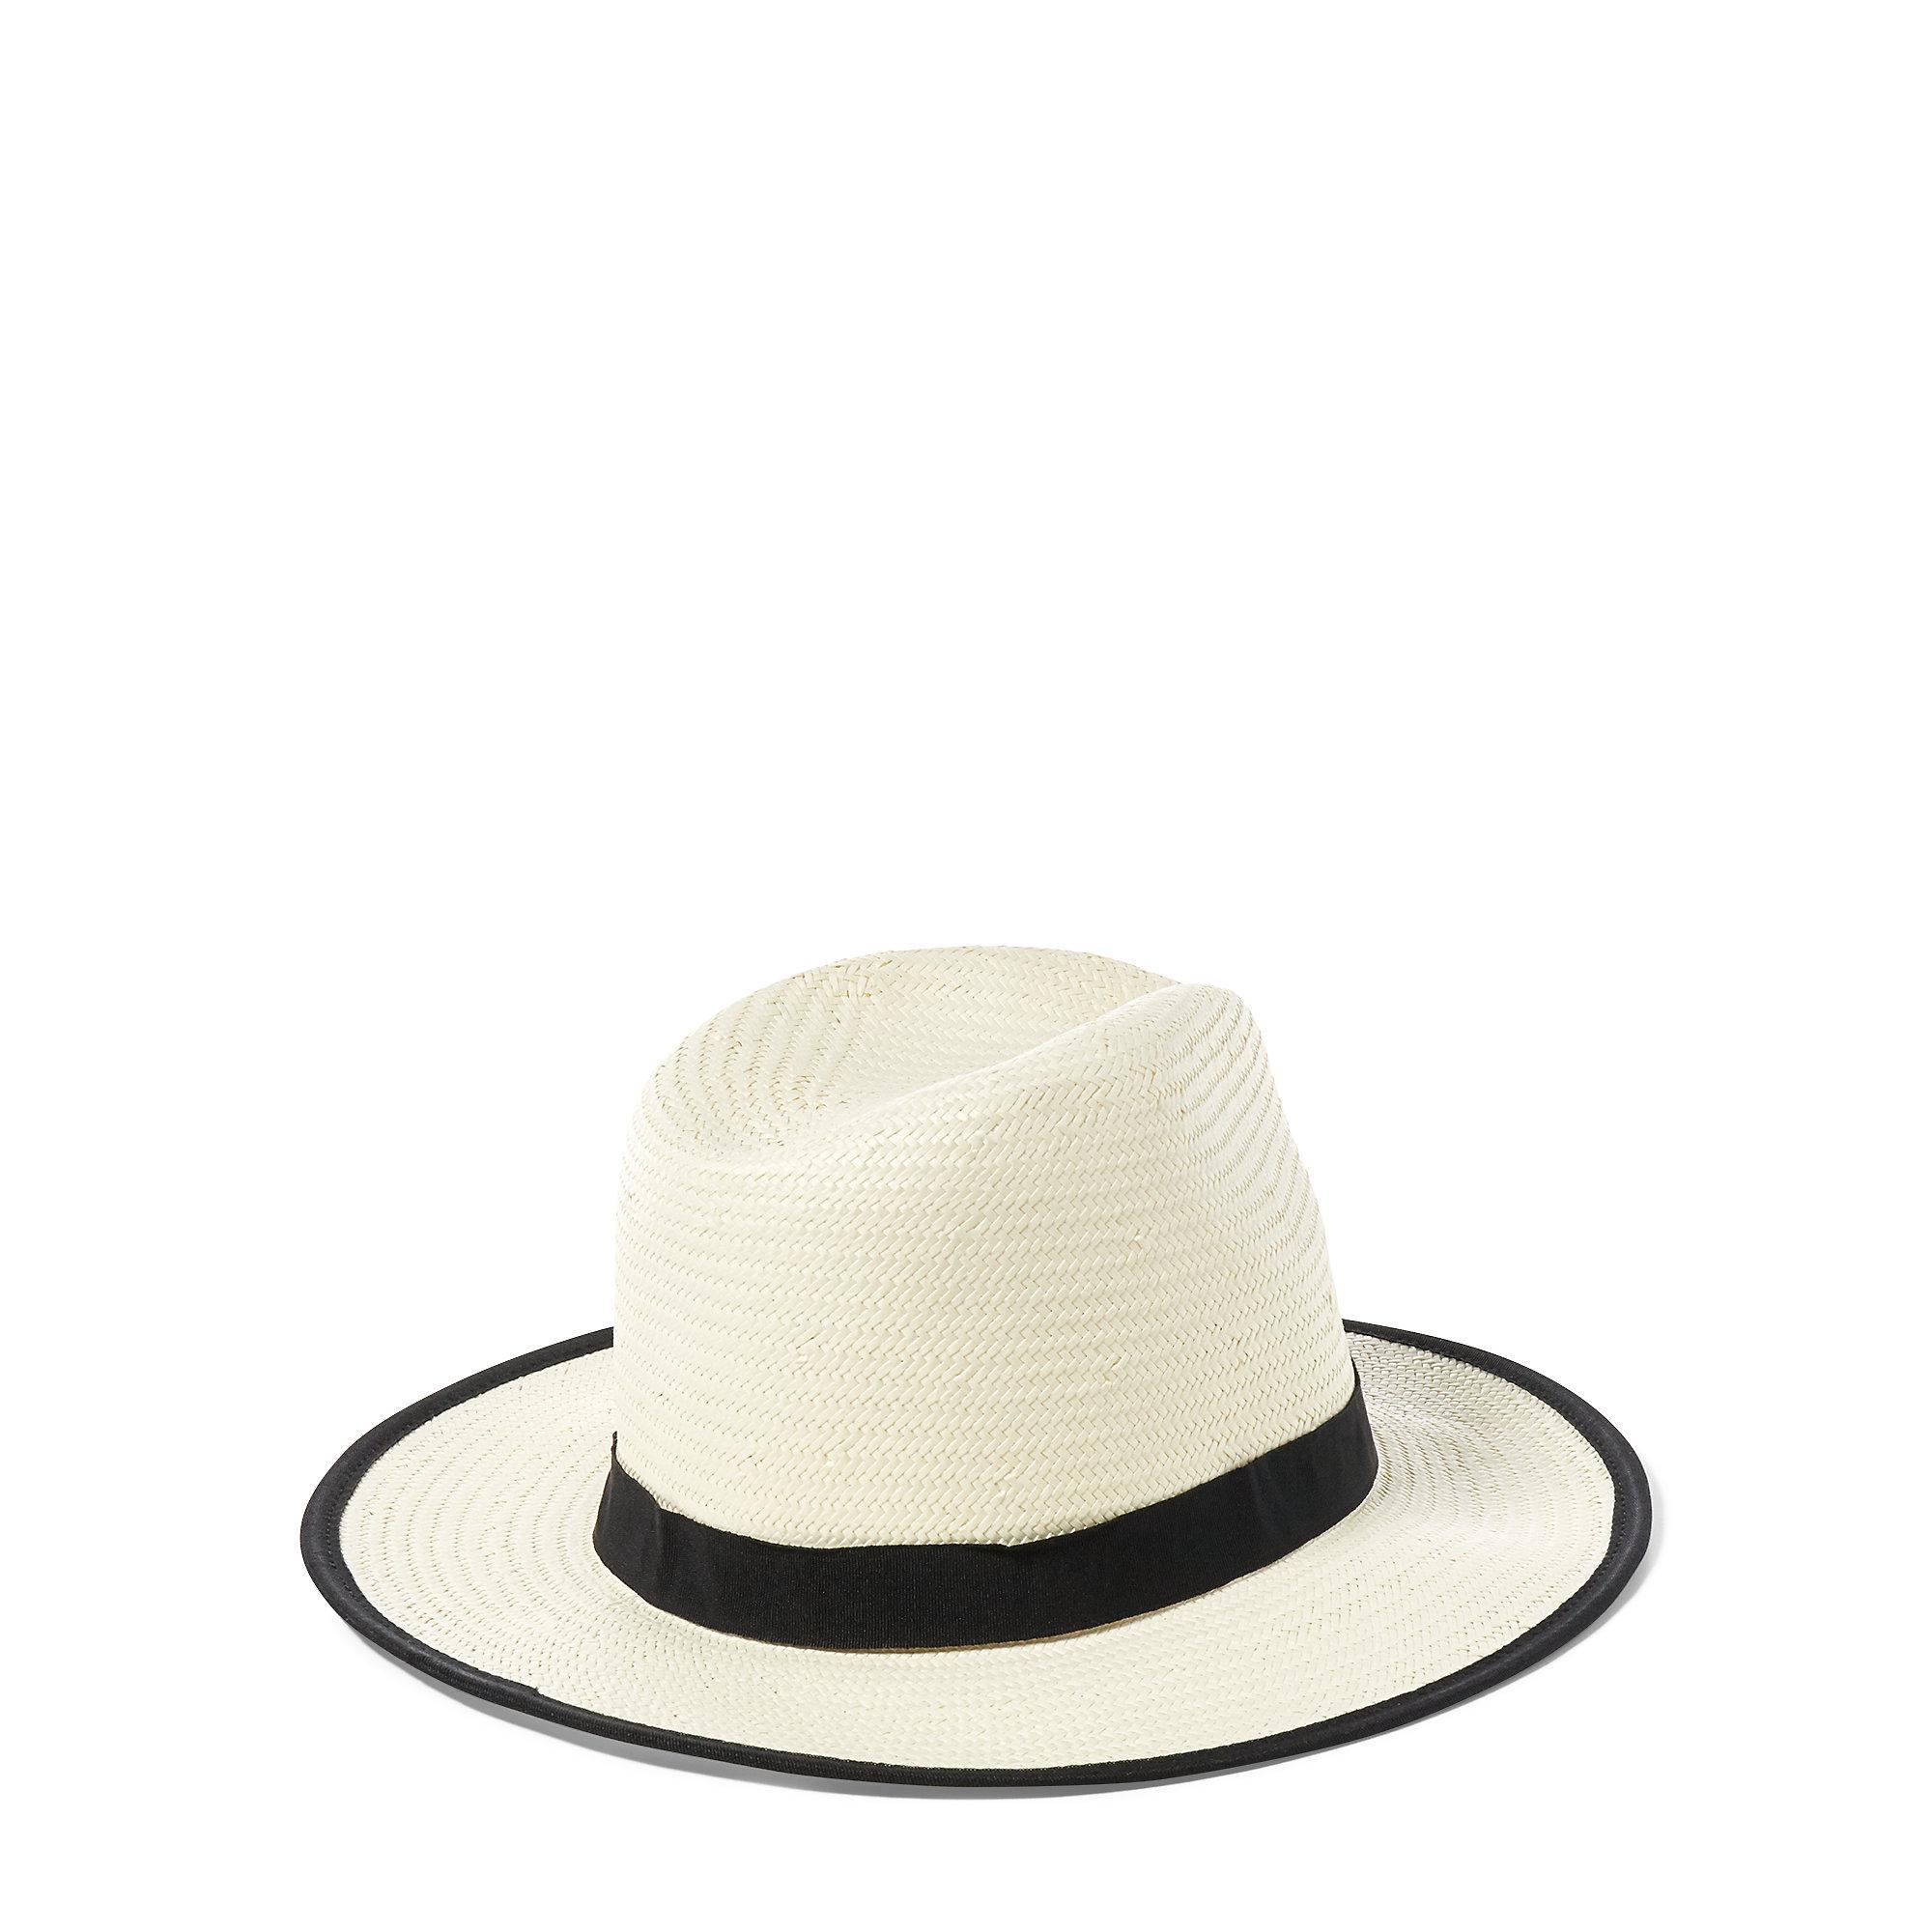 Ralph Lauren Panama Hat in Natural for Men - Lyst